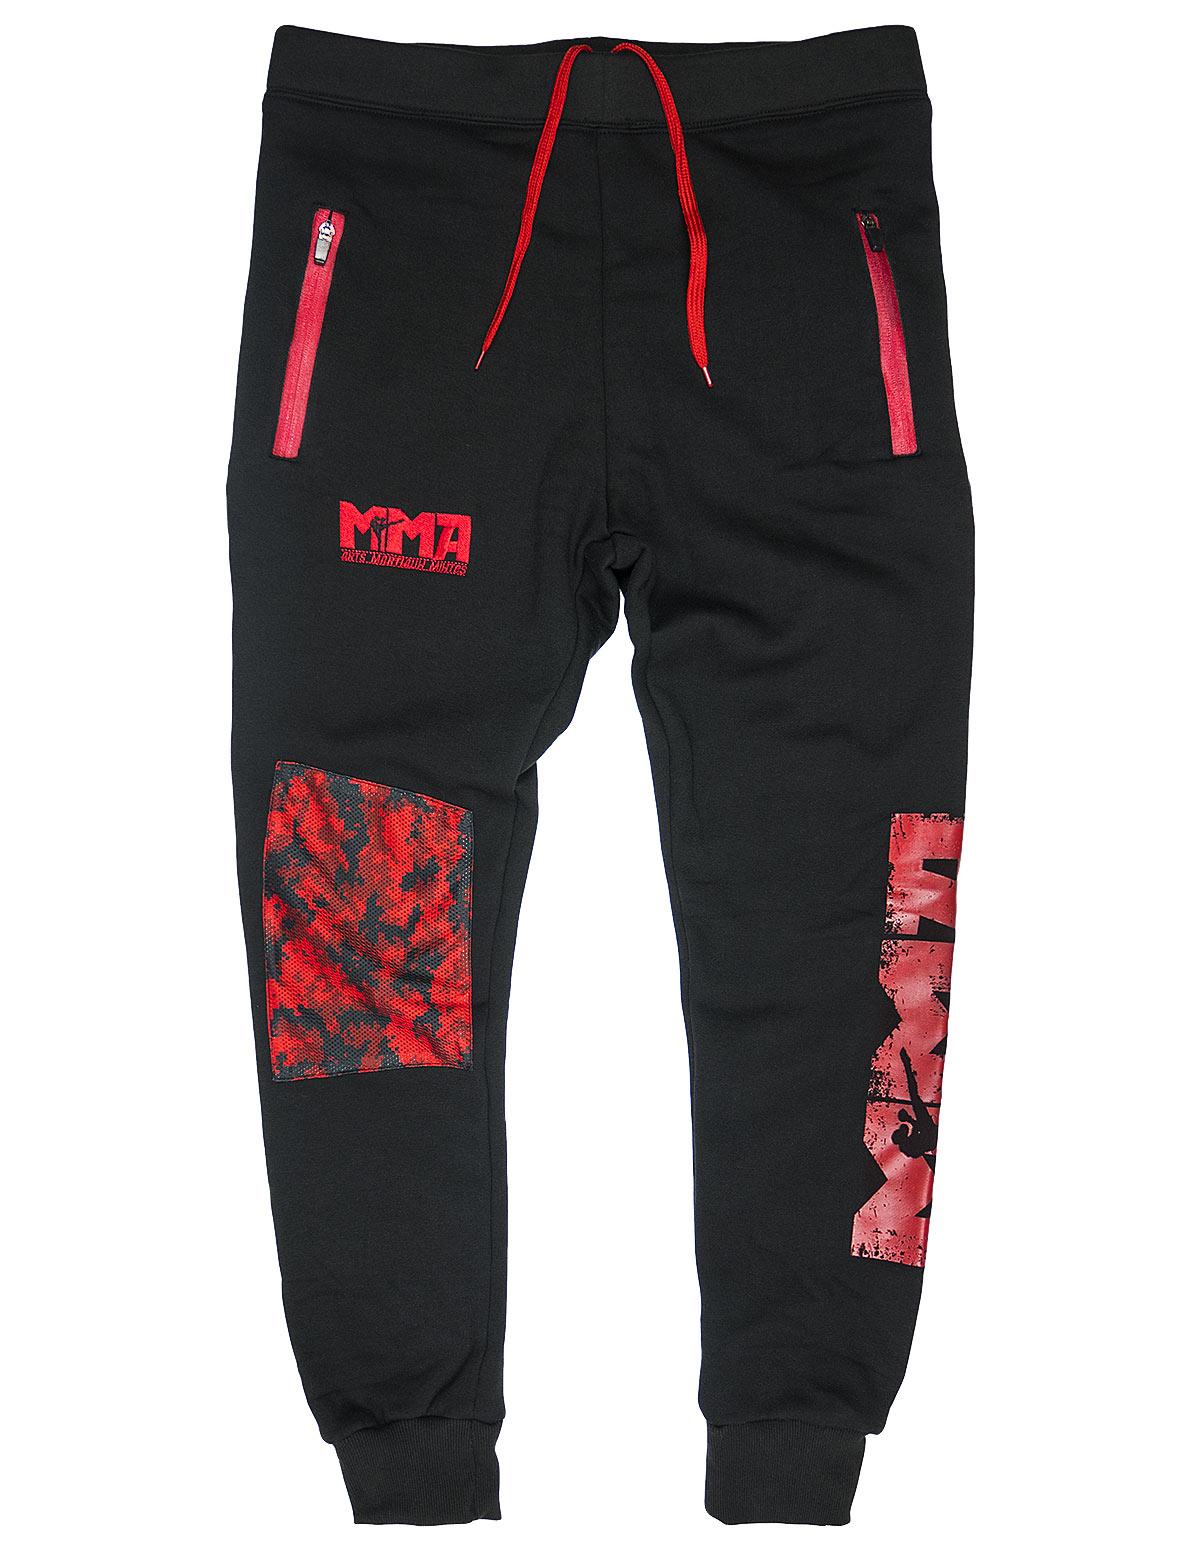 Pantalon-survetement-MMA-camouflage